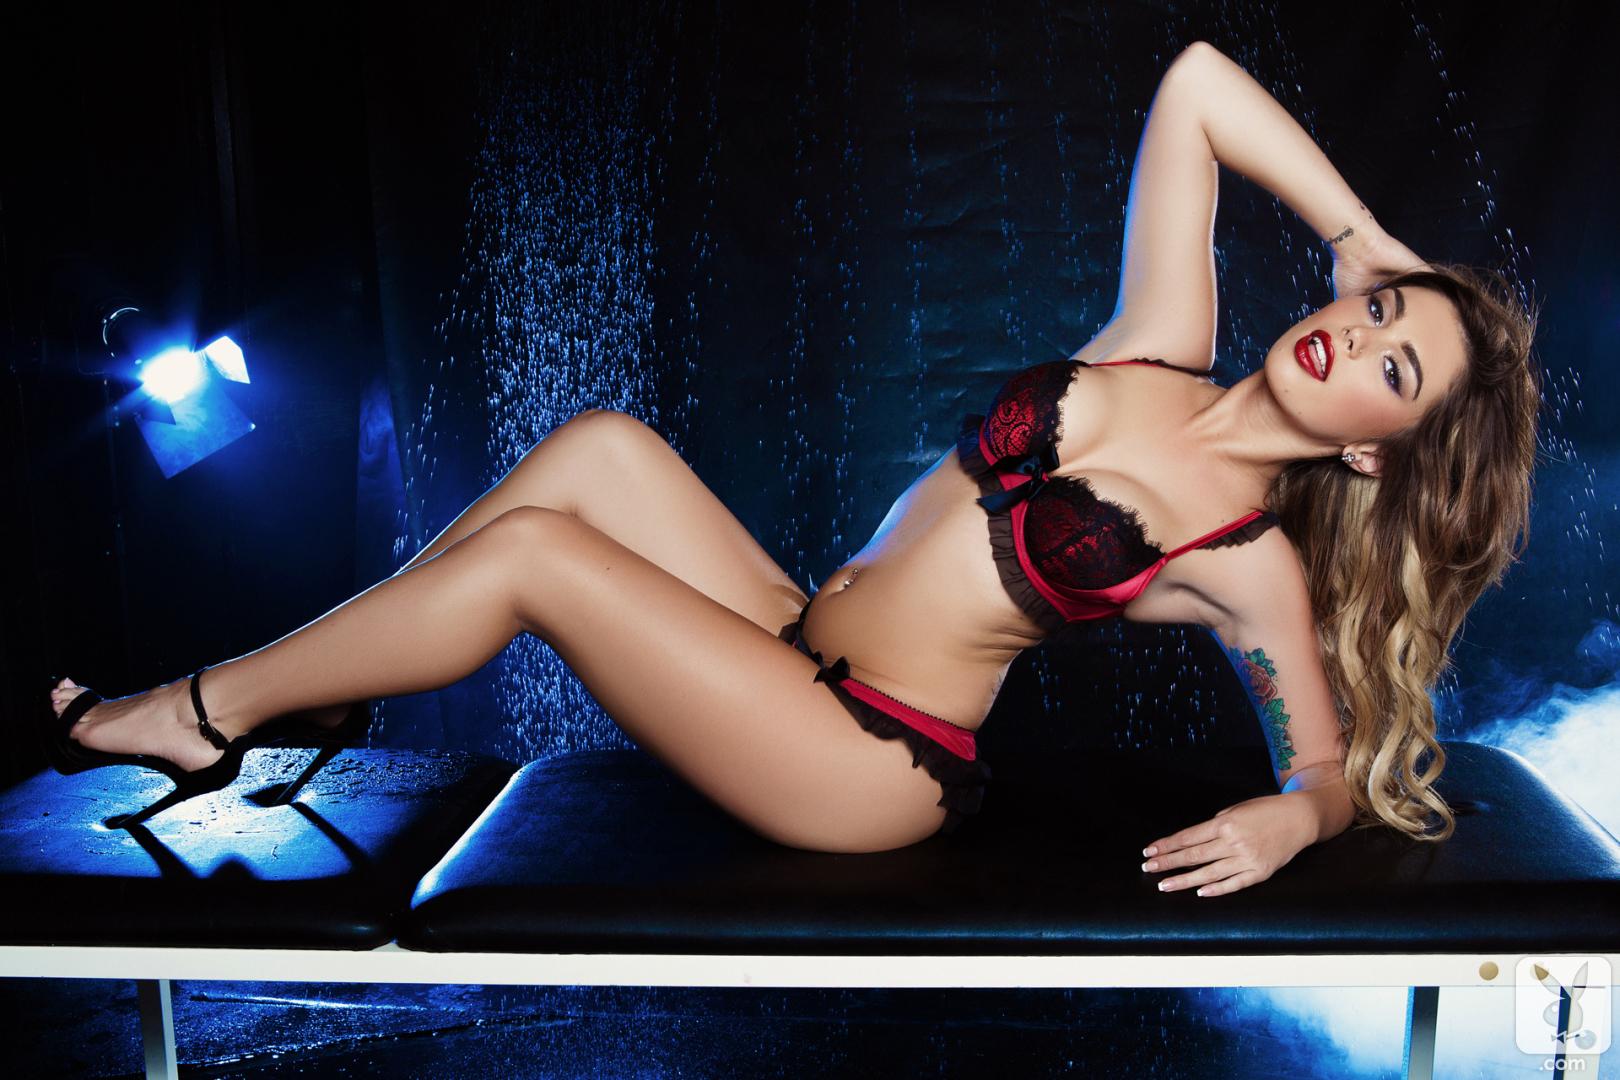 Playboy Cybergirl - Anika Shay Nude Photos & Videos at Playboy Plus!